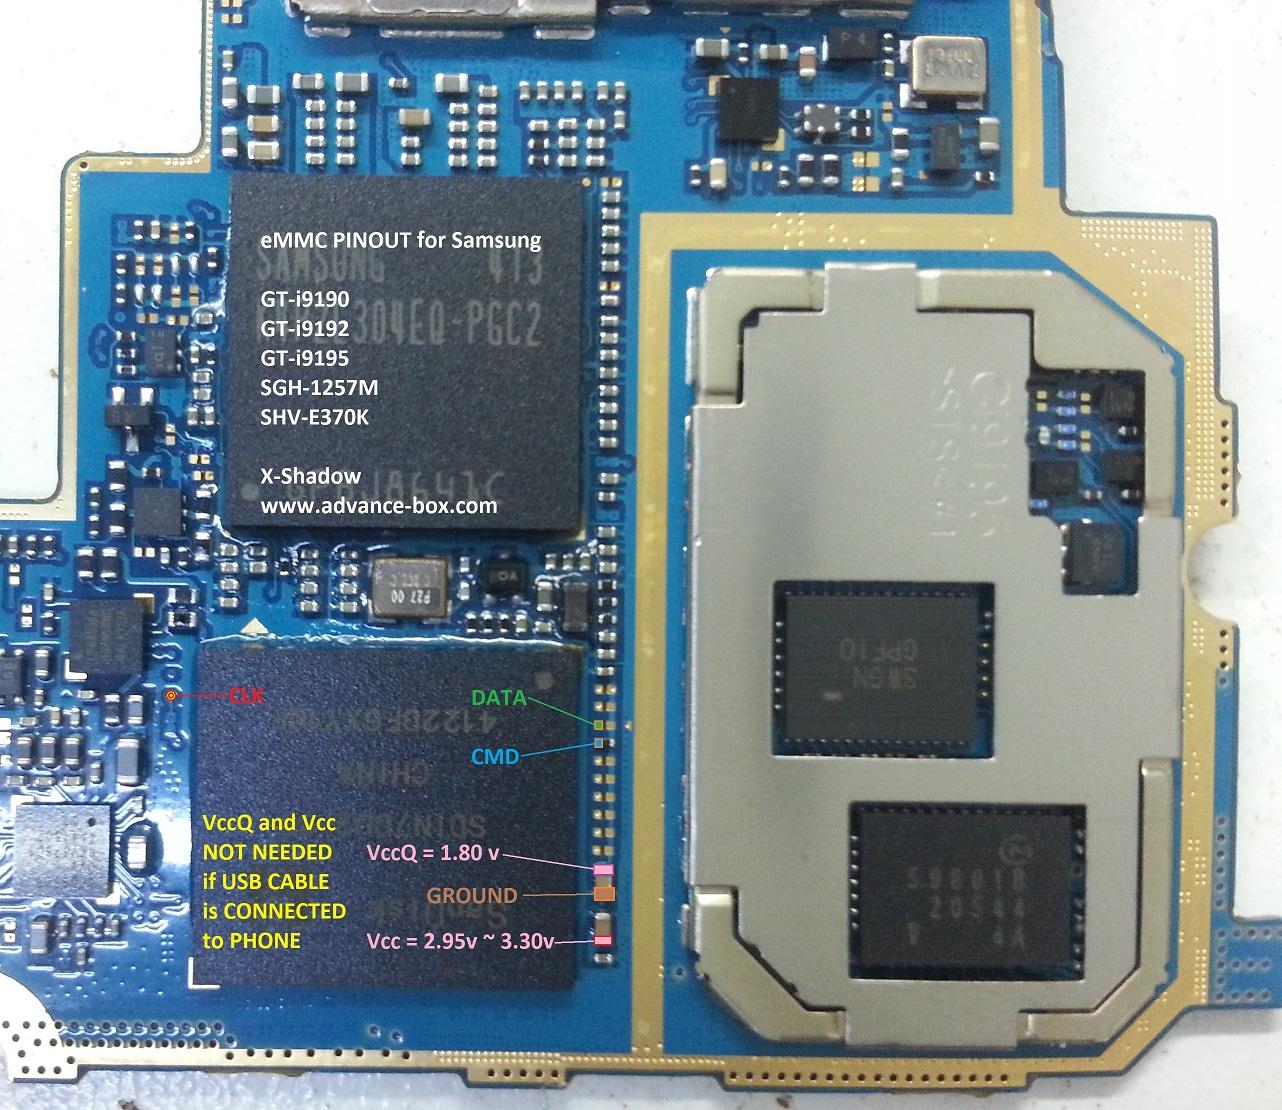 PINOUT DIRECT EMMC SAMSUNG VIA UFI BOX - DROIDUNBRICK